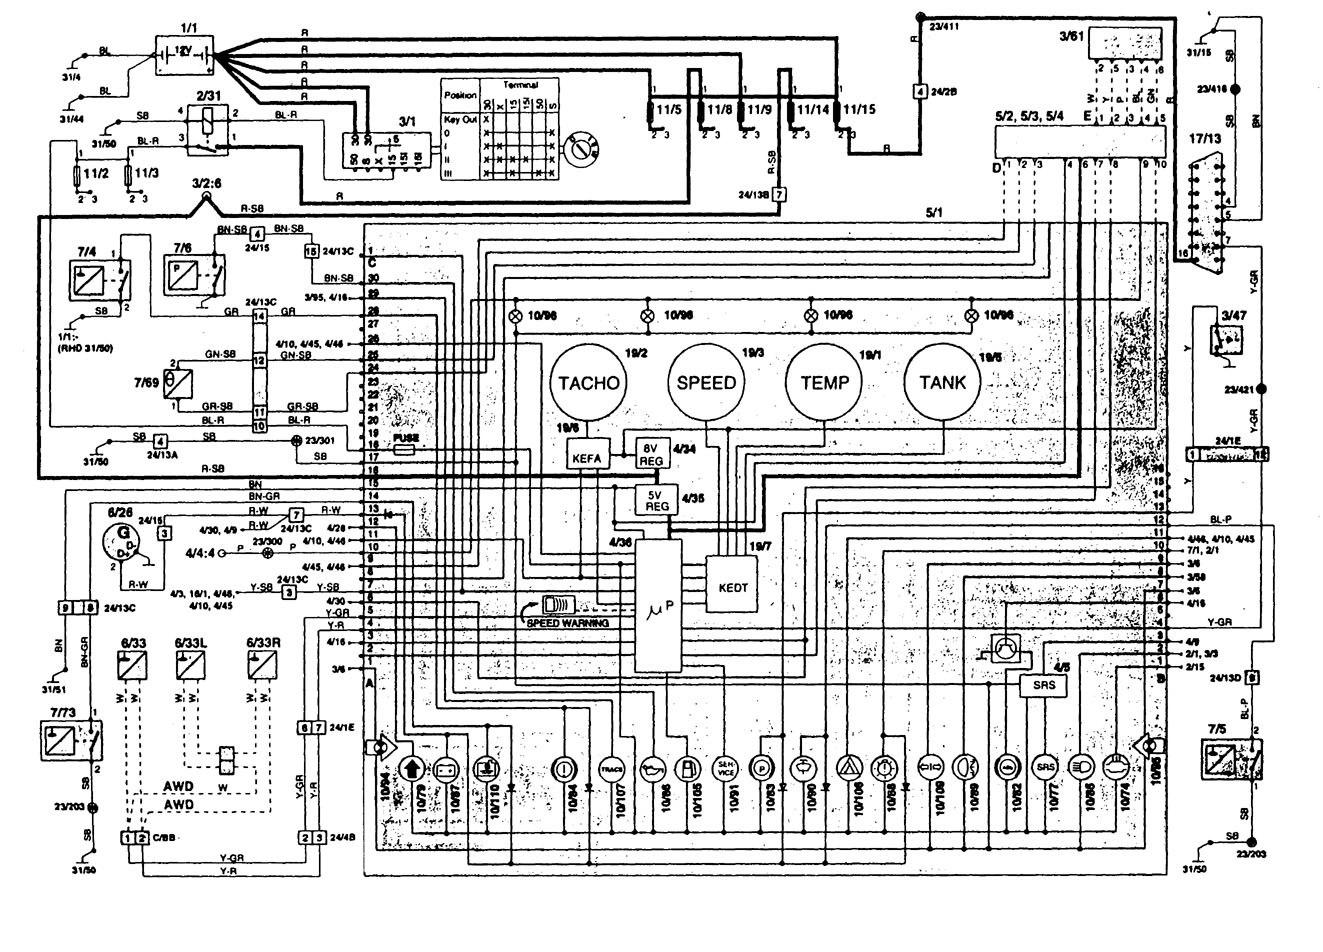 1997 Volvo 850 Ac Wiring Diagram Wiring Diagram Rich Hit A Rich Hit A Lechicchedimammavale It